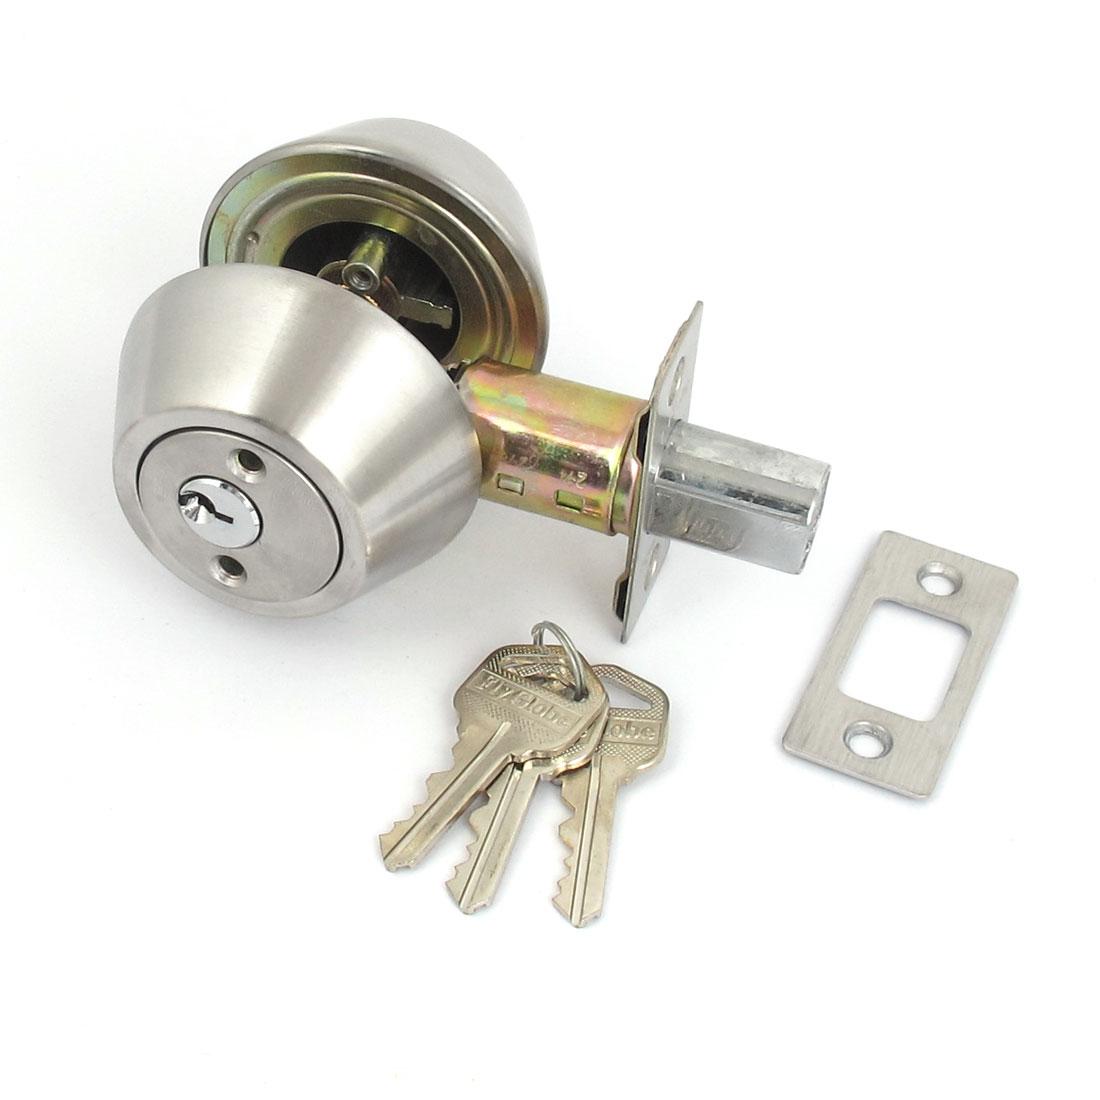 Home Office Door Cylinder Deadbolt Metal Lock Hardware Silver Tone w Keys